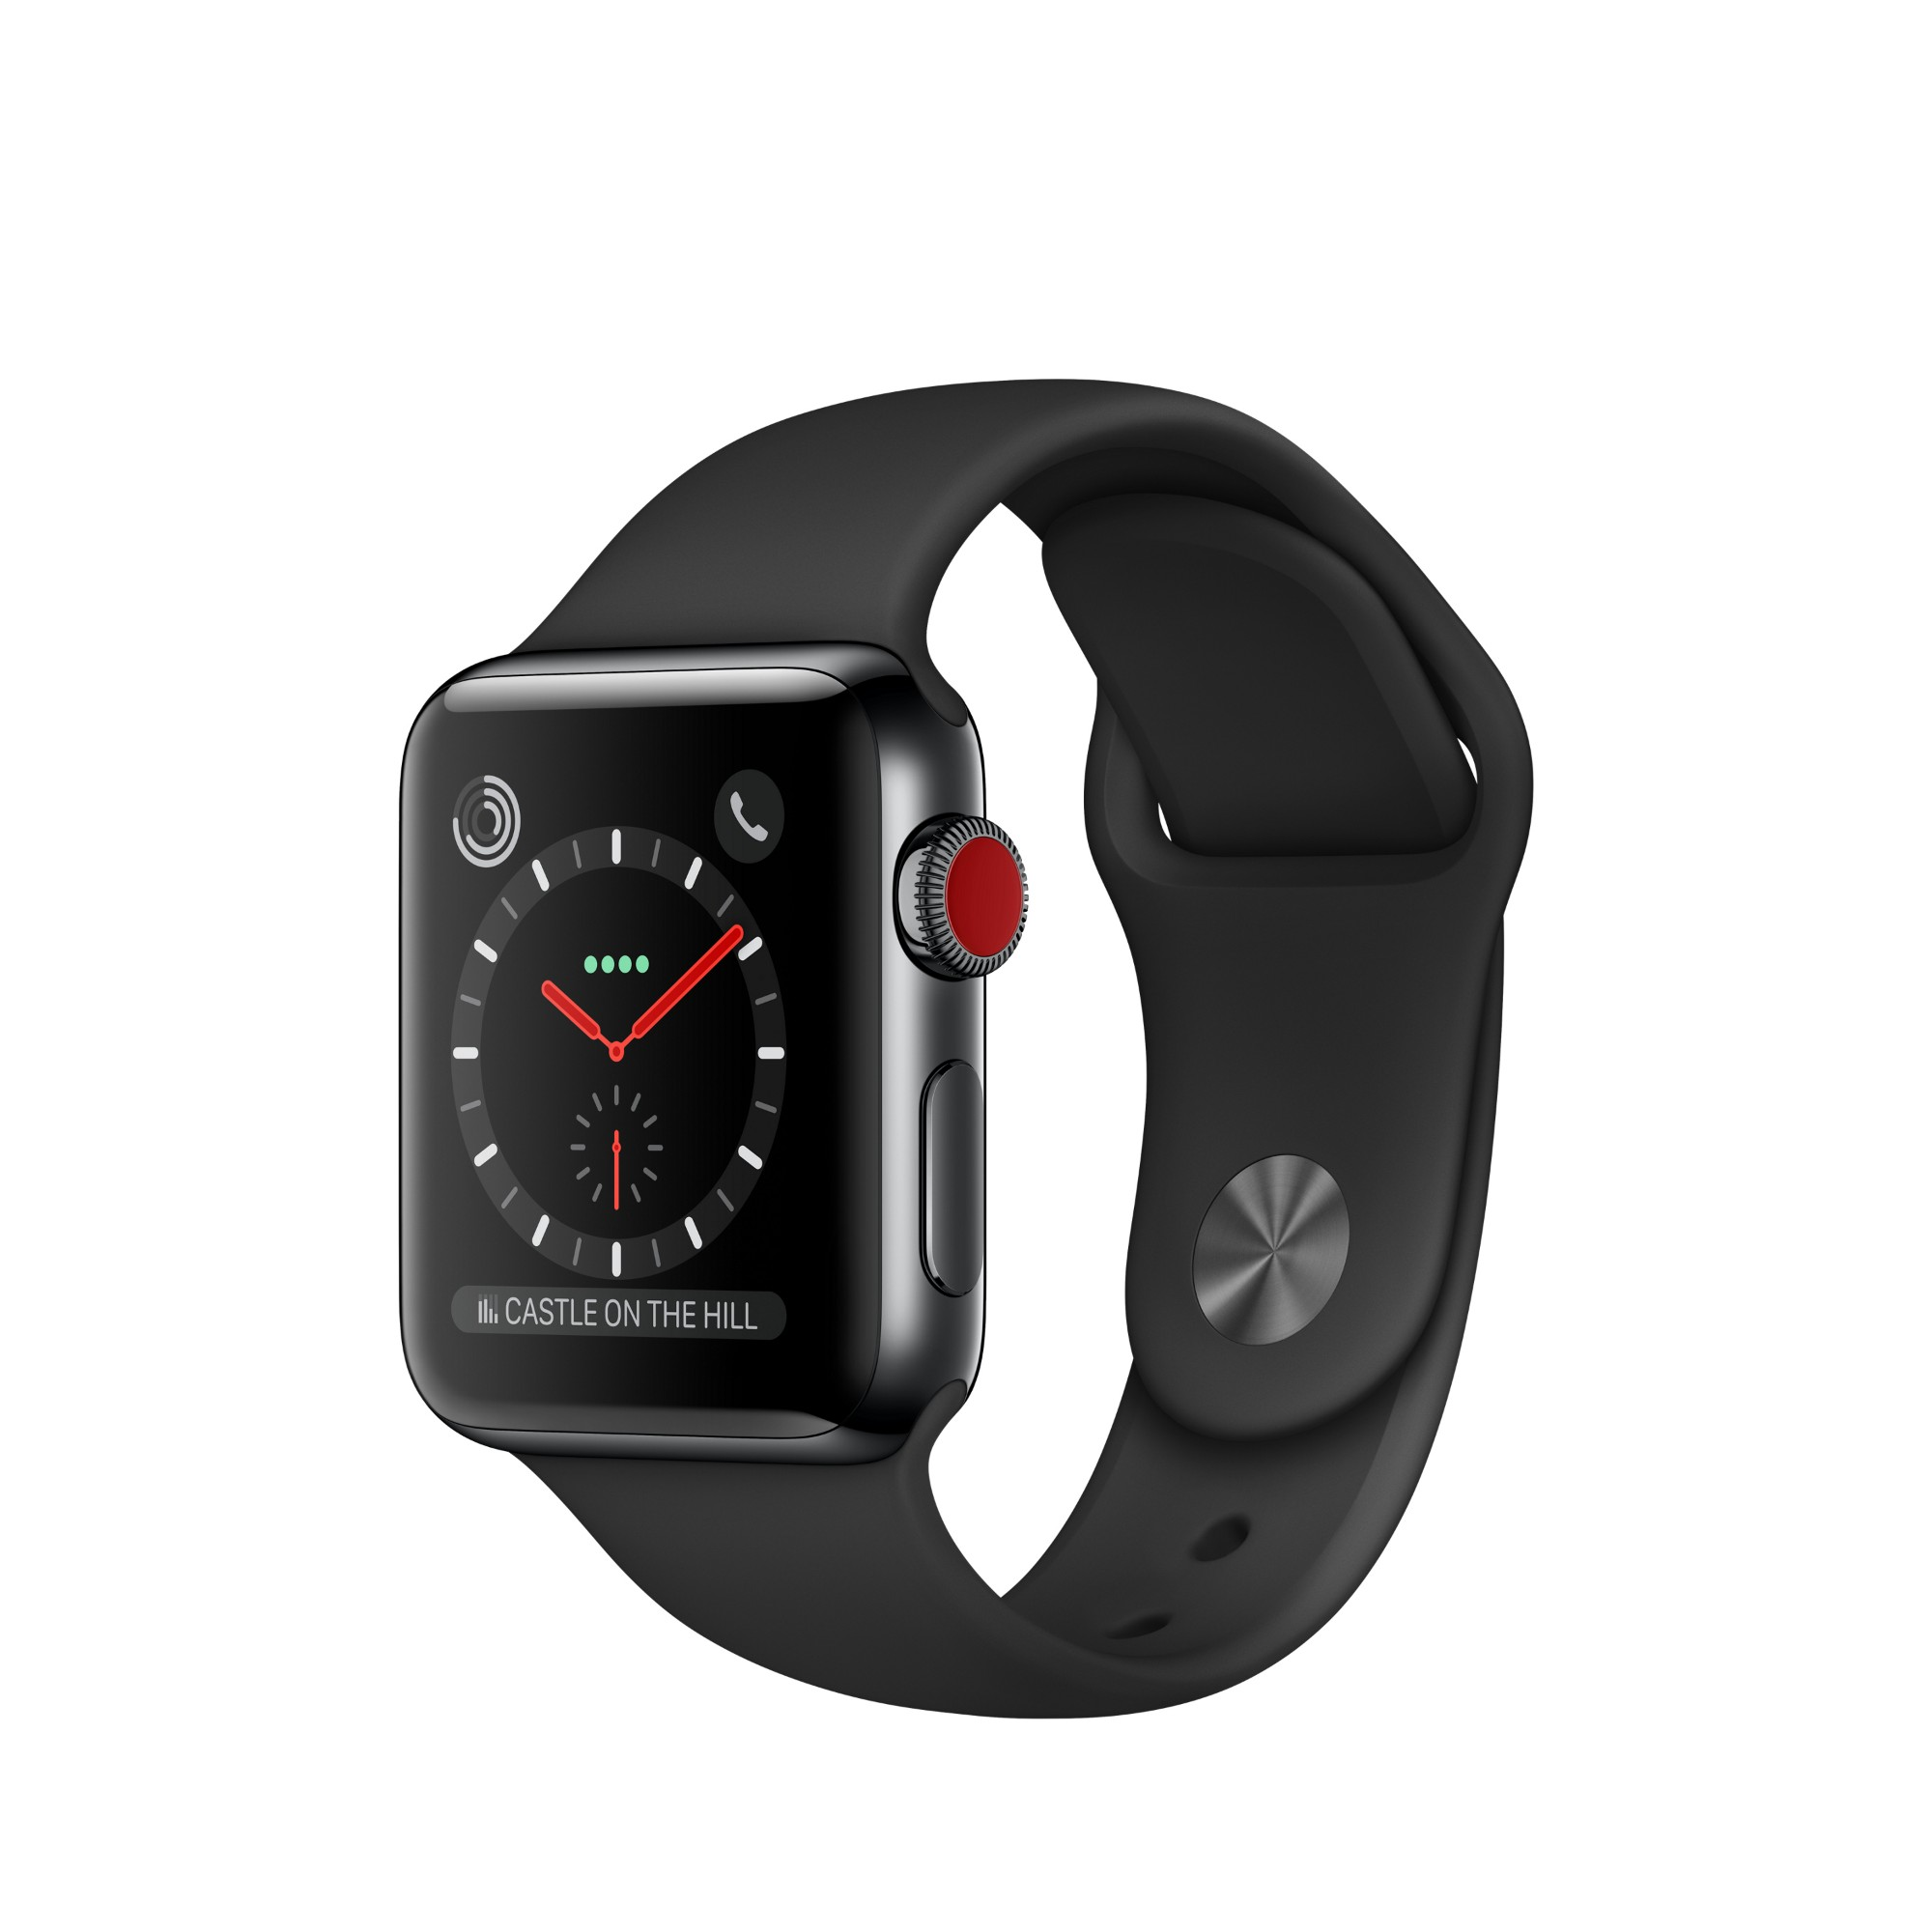 Apple Watch Series 3 OLED GPS (satellite) Cellular Black smartwatch